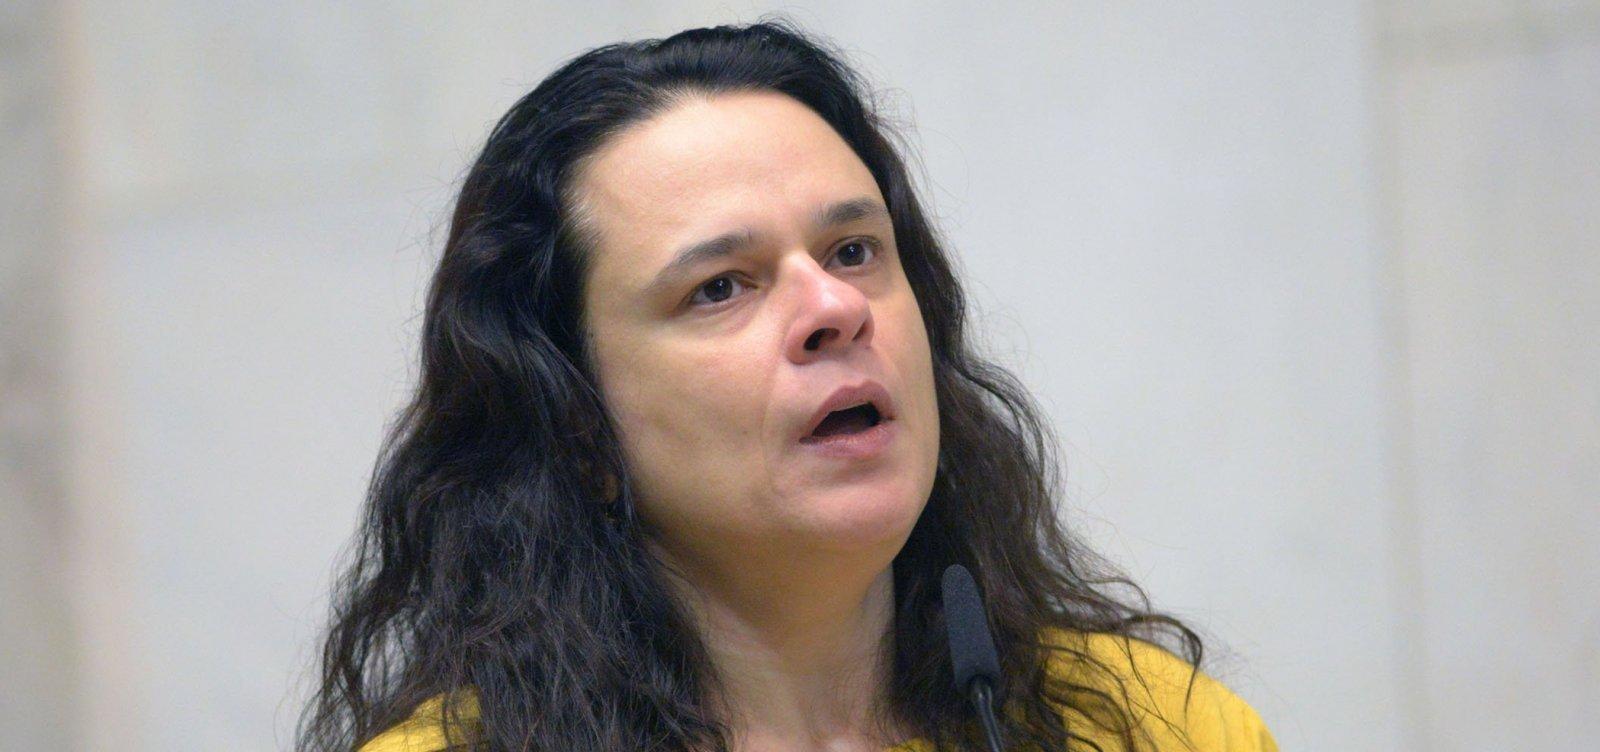 [Janaina Paschoal protocola pedido de impeachment contra Toffoli]